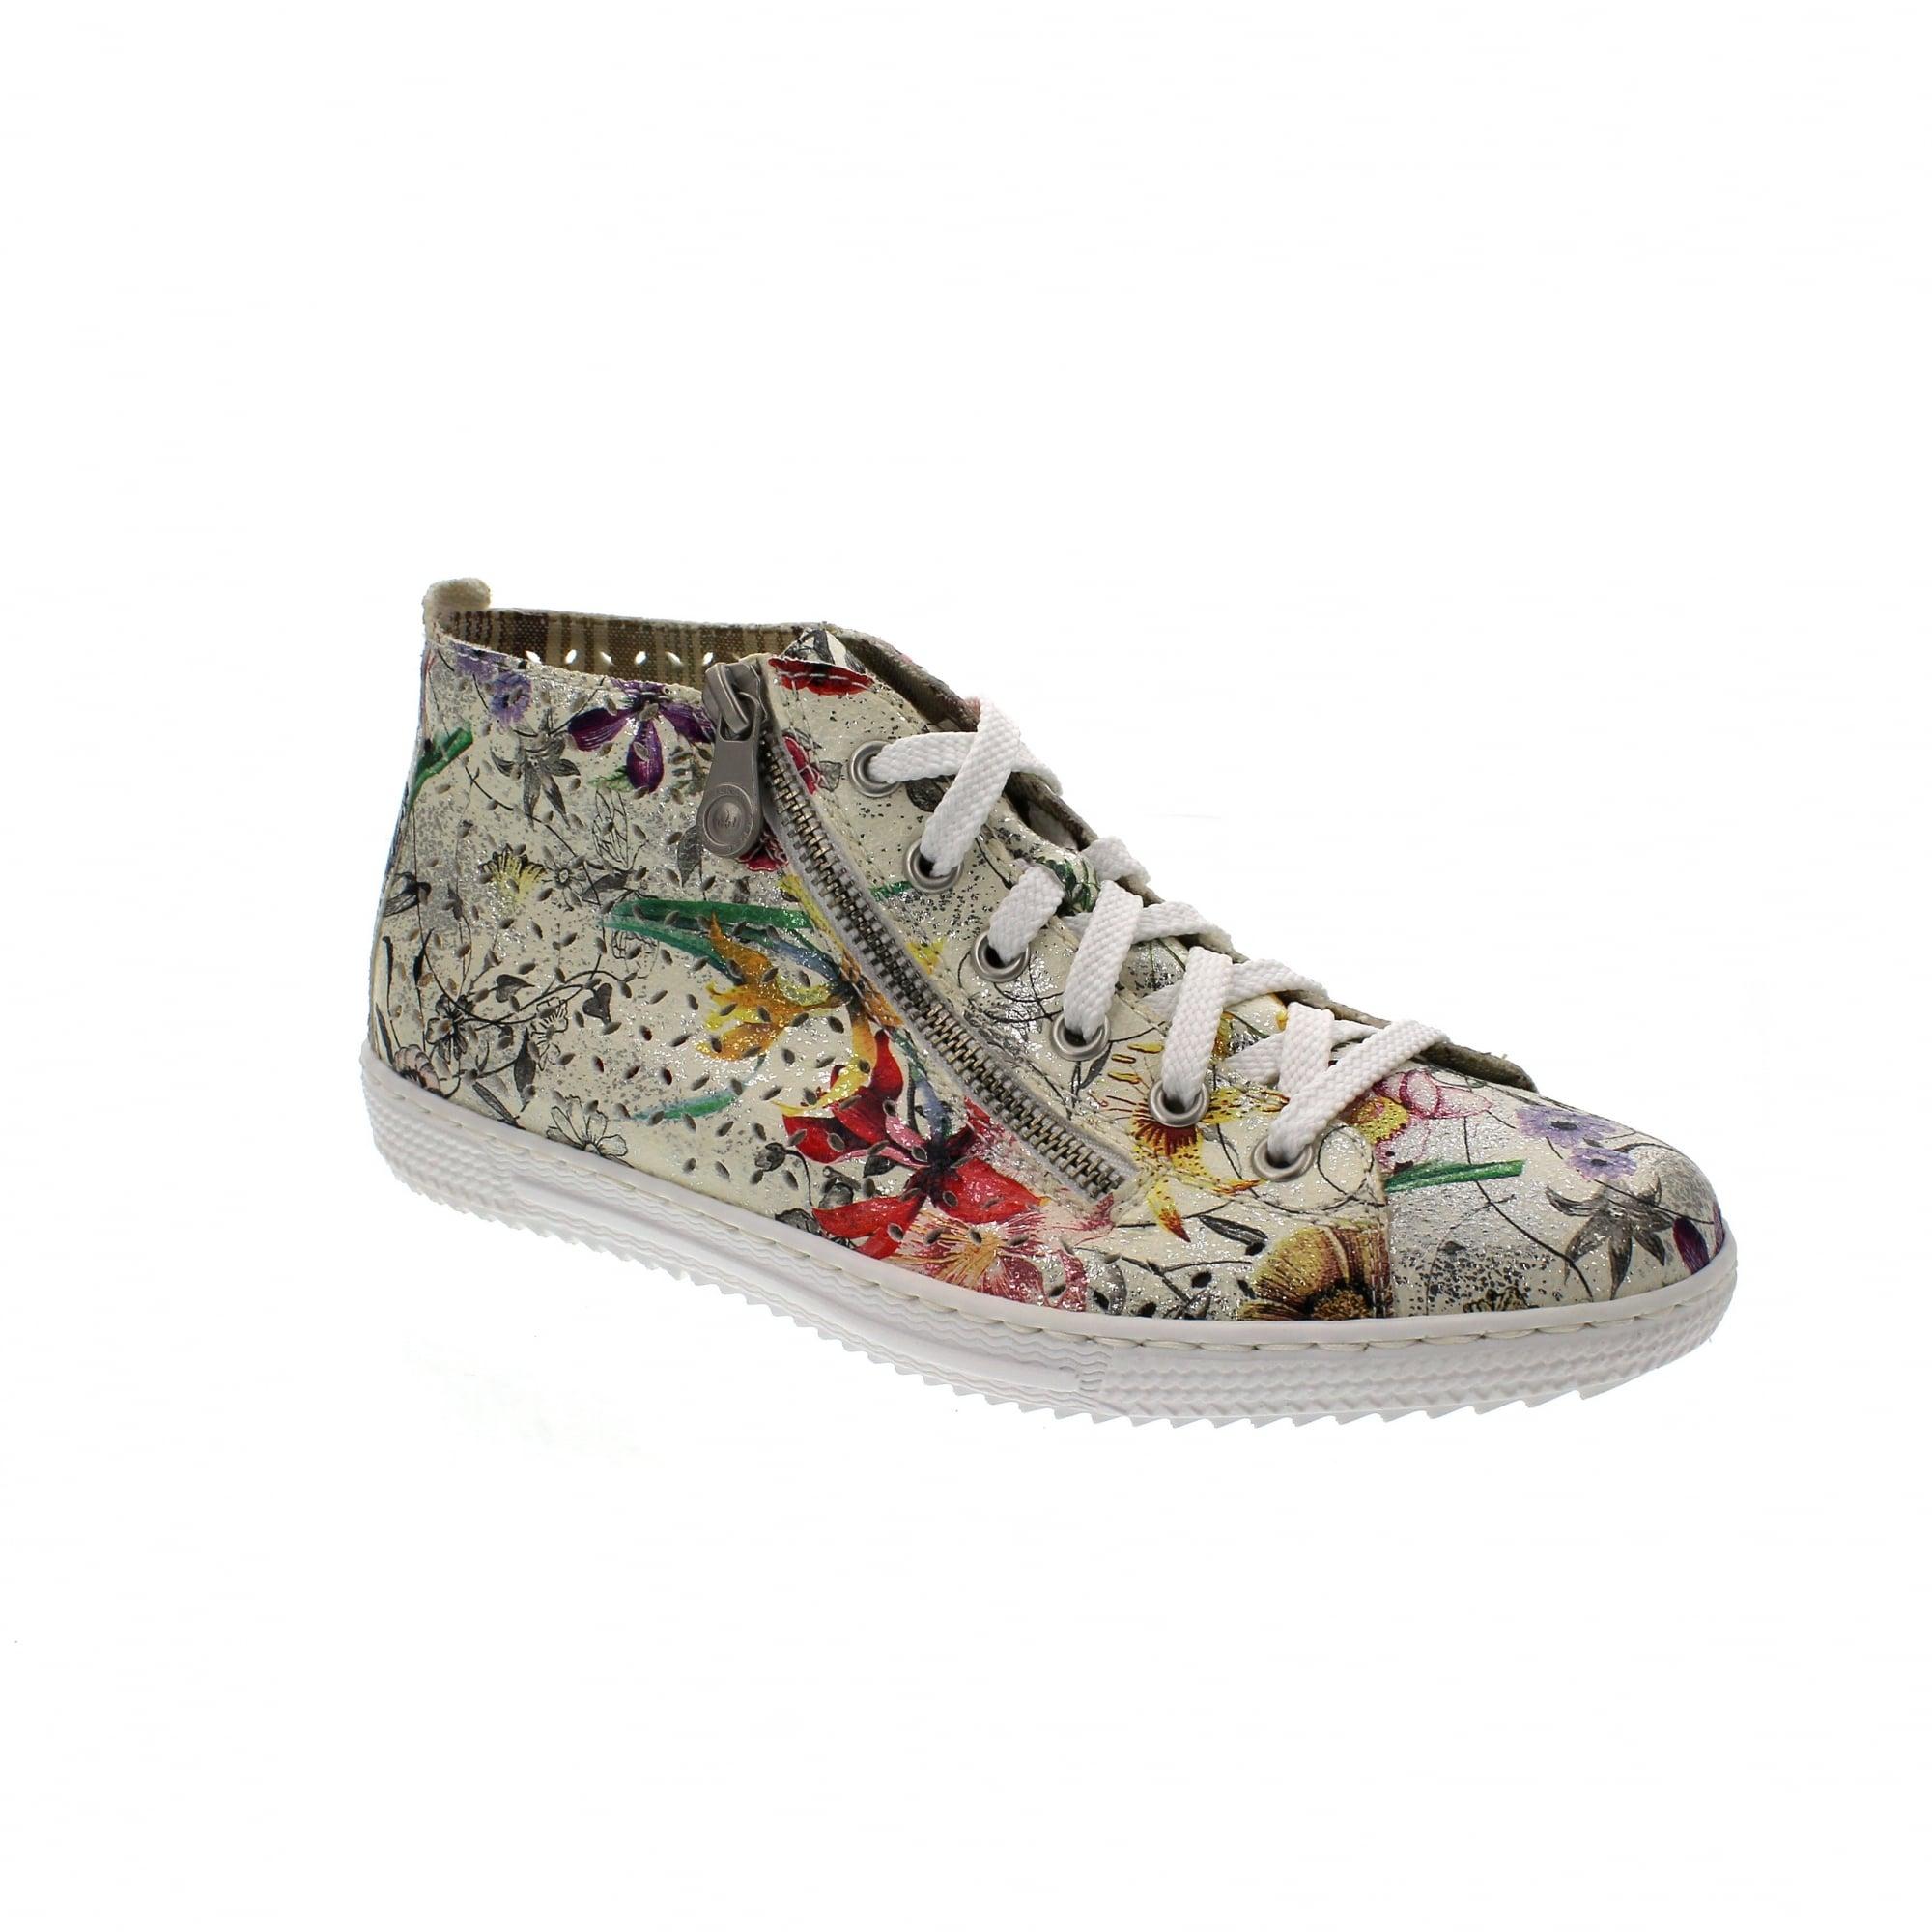 94c6aa25cb1b Rieker L9426-90 - Womens from Rogerson Shoes UK